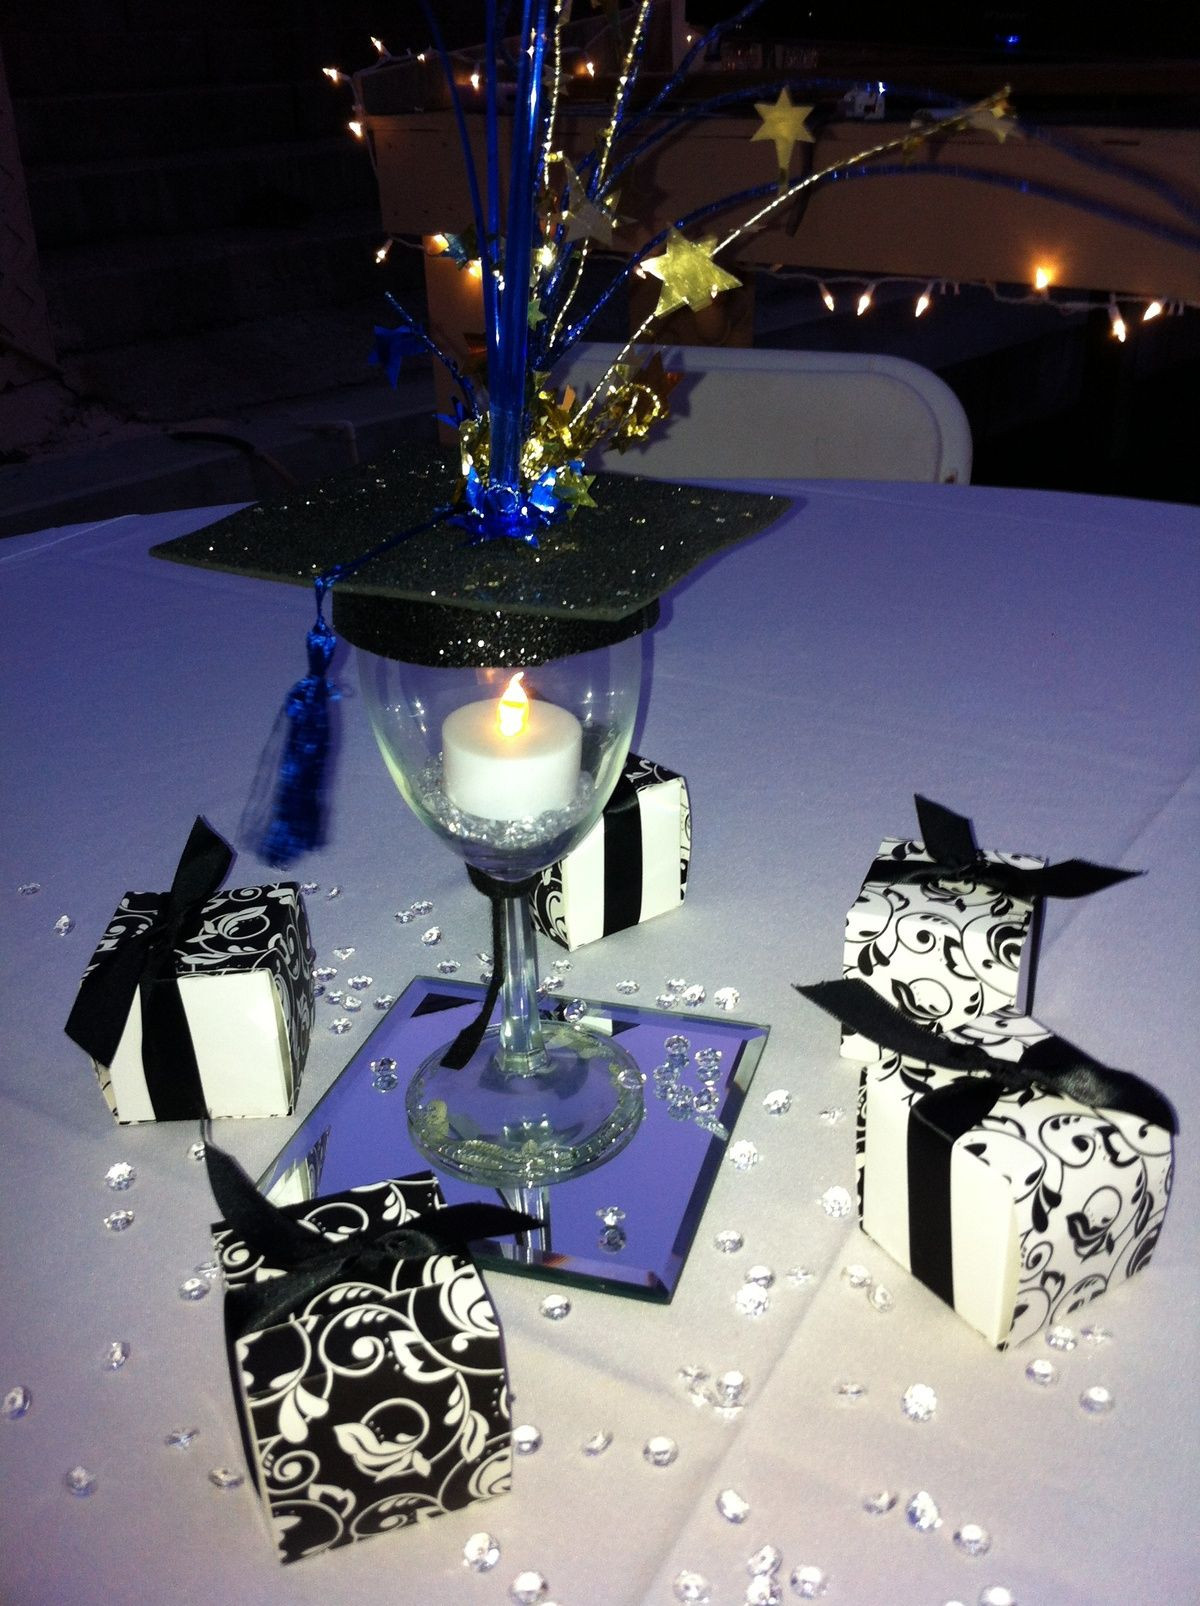 Table Decorations For Graduation Party Ideas  f582badc08a34eab99c30a c500 1 200×1 606 pixels